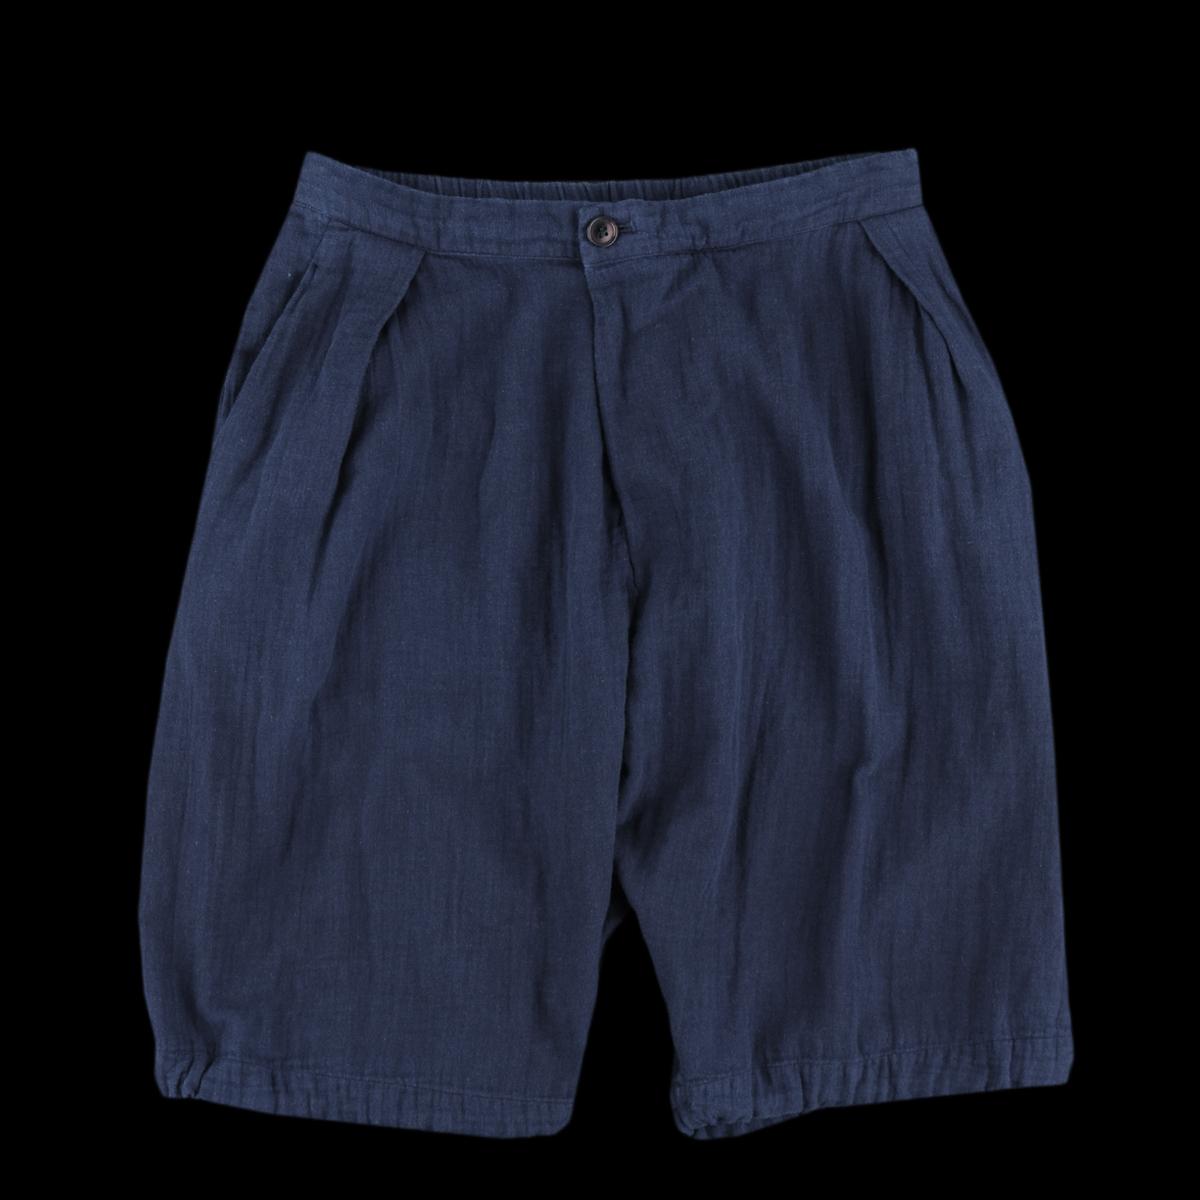 stylish men's shorts styleforum kneecaps on parade summer shorts stylish summer shorts styleforum how to wear shorts styleforum